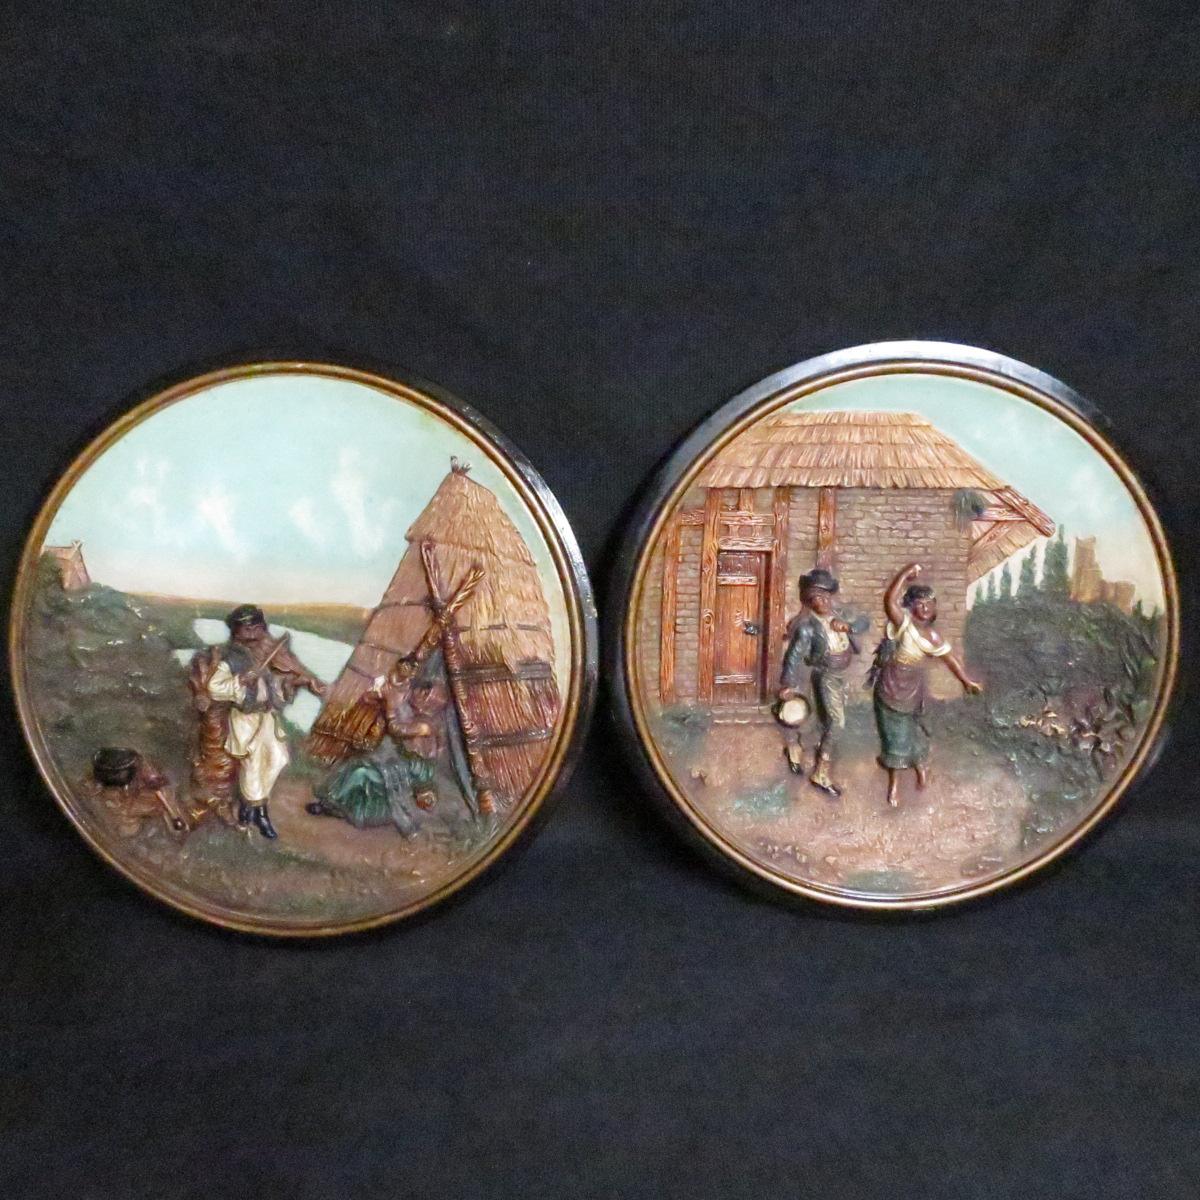 Johann Maresch Pair Of Plates Plates Pottery Central European Gypsies